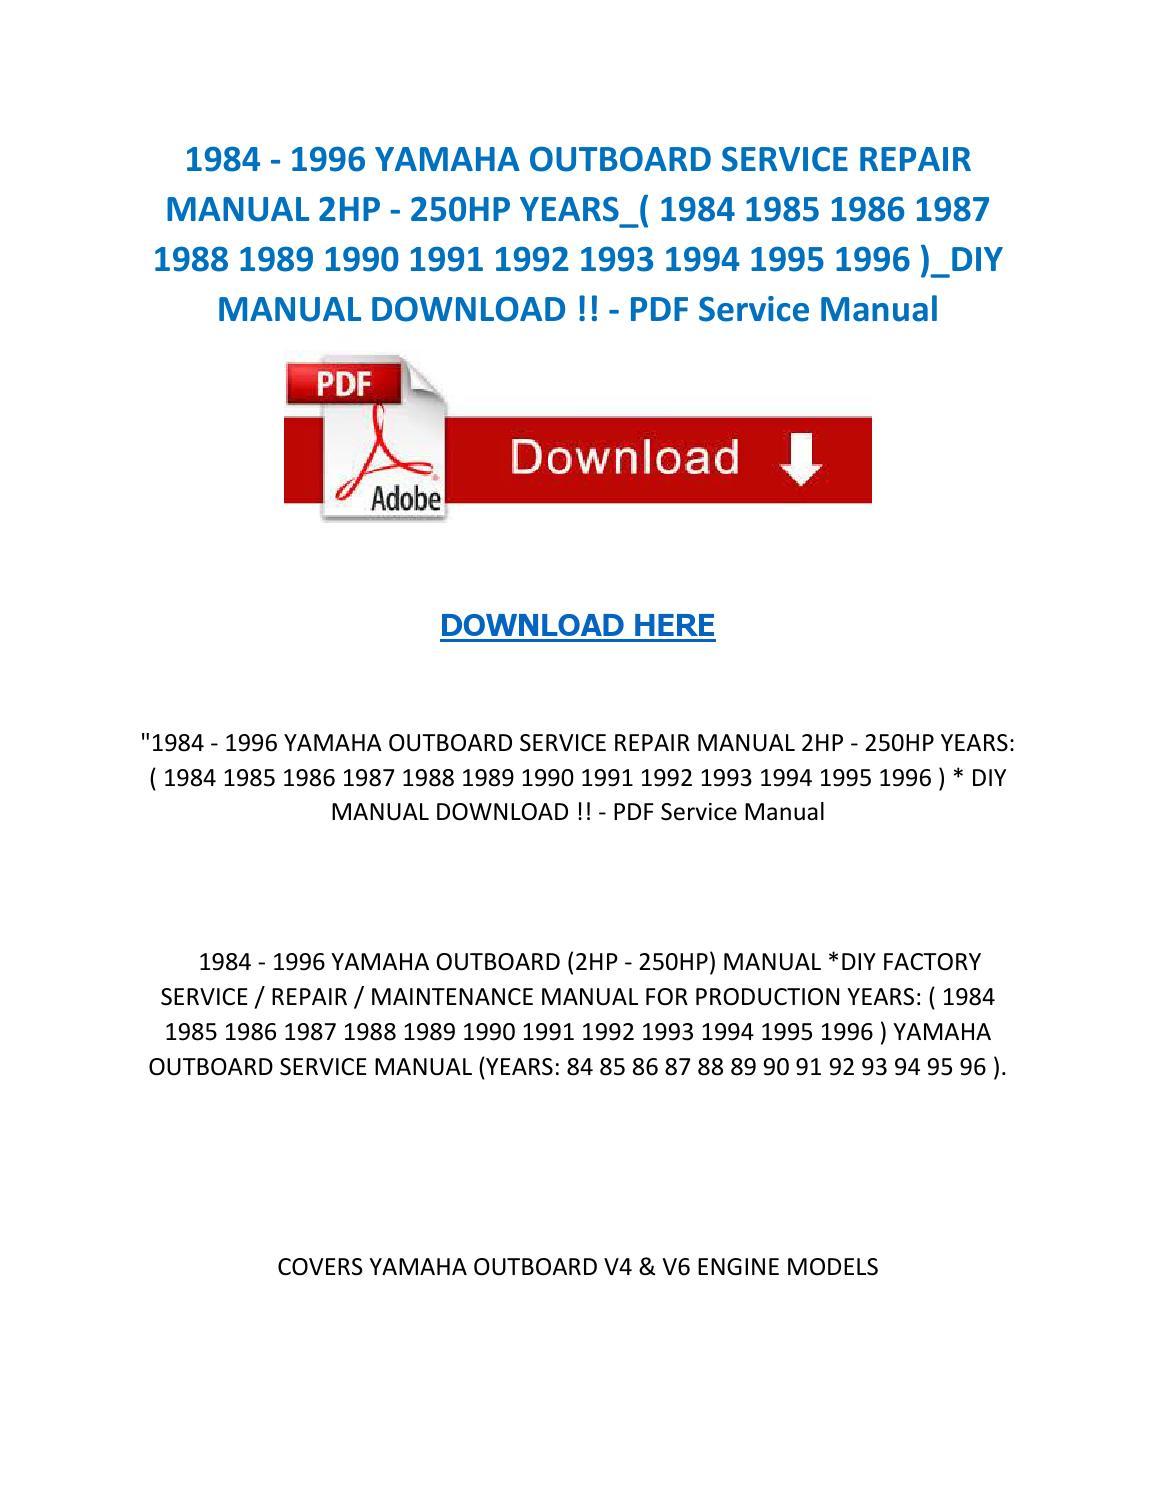 1989 yamaha outboard service manual